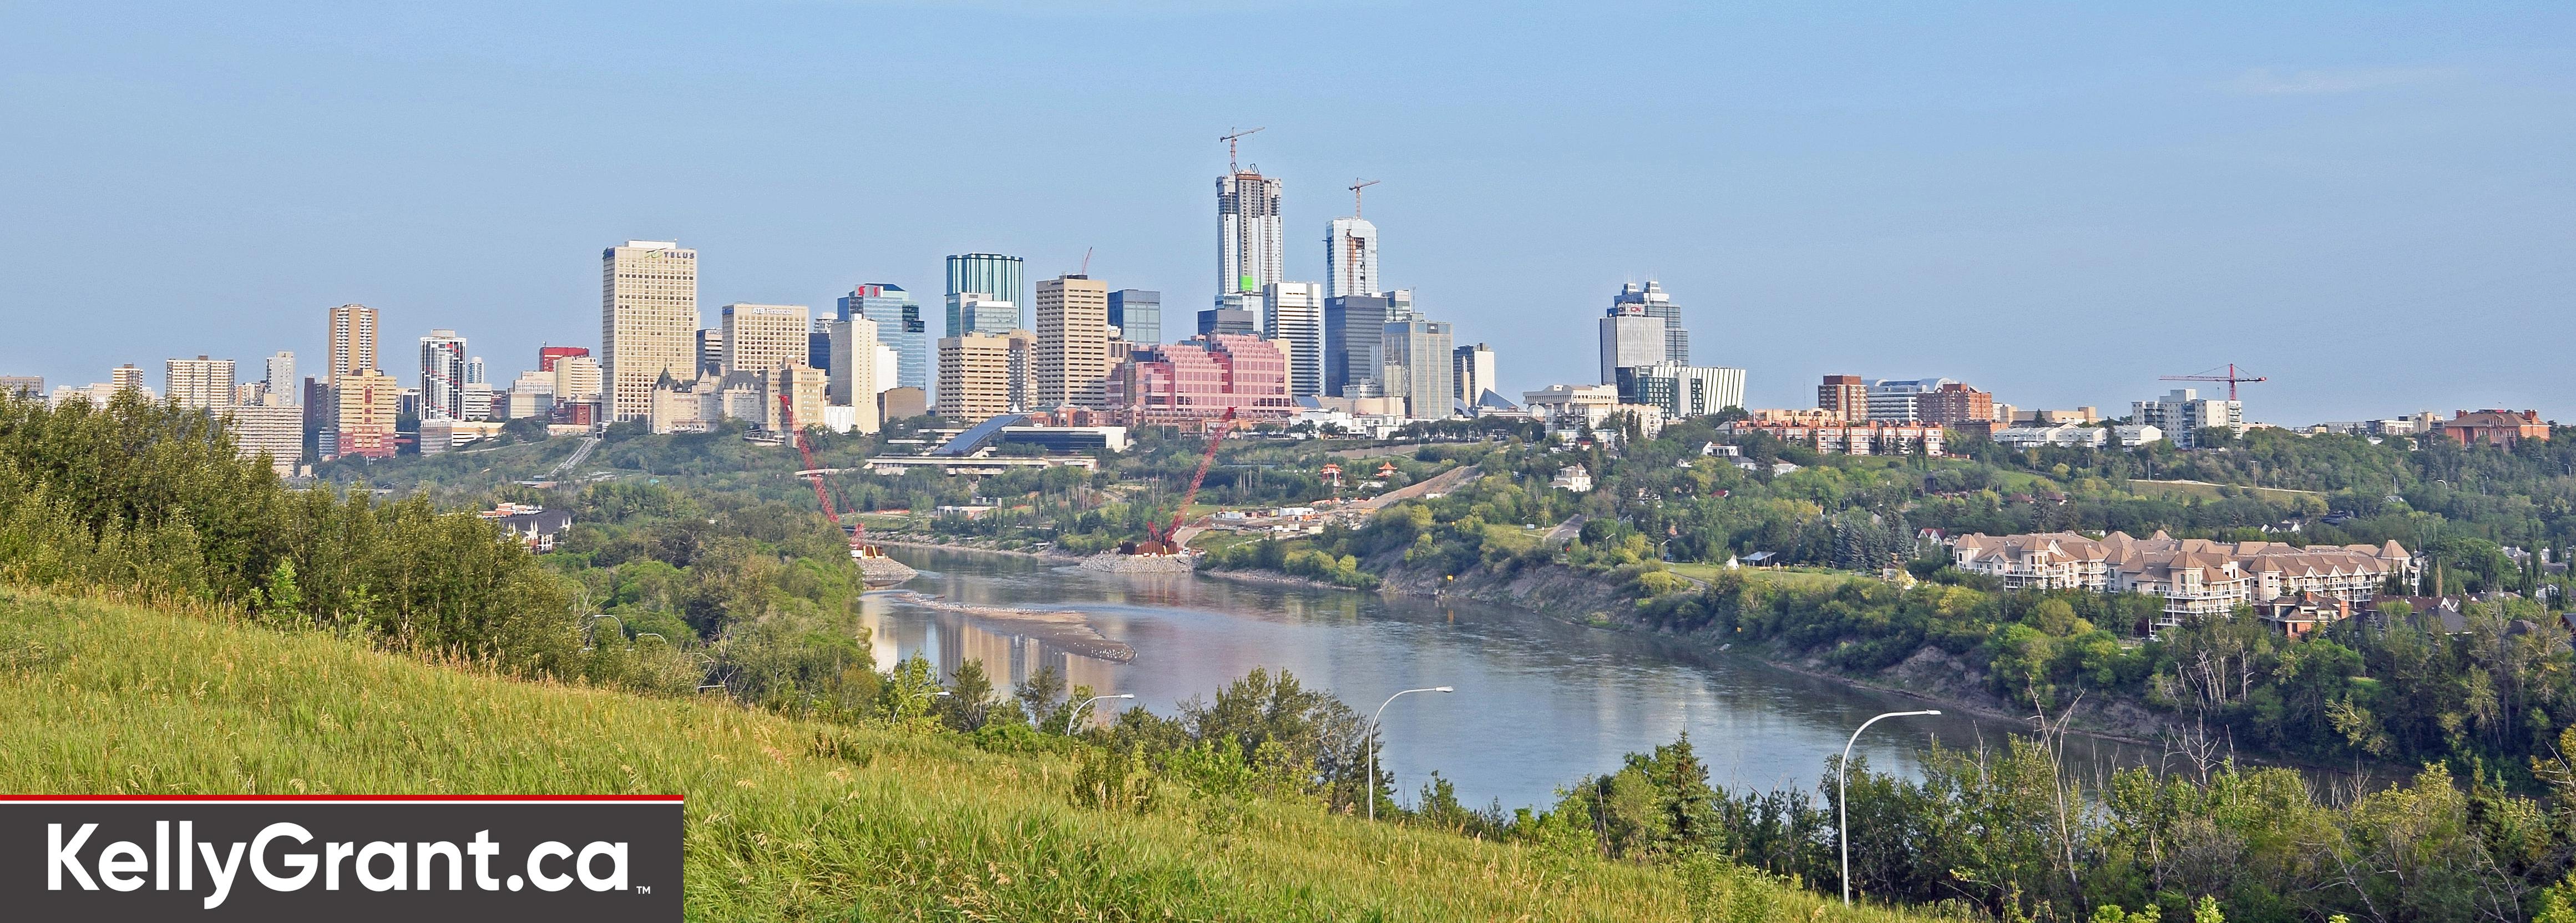 Kelly Grant - City of Edmonton Summer